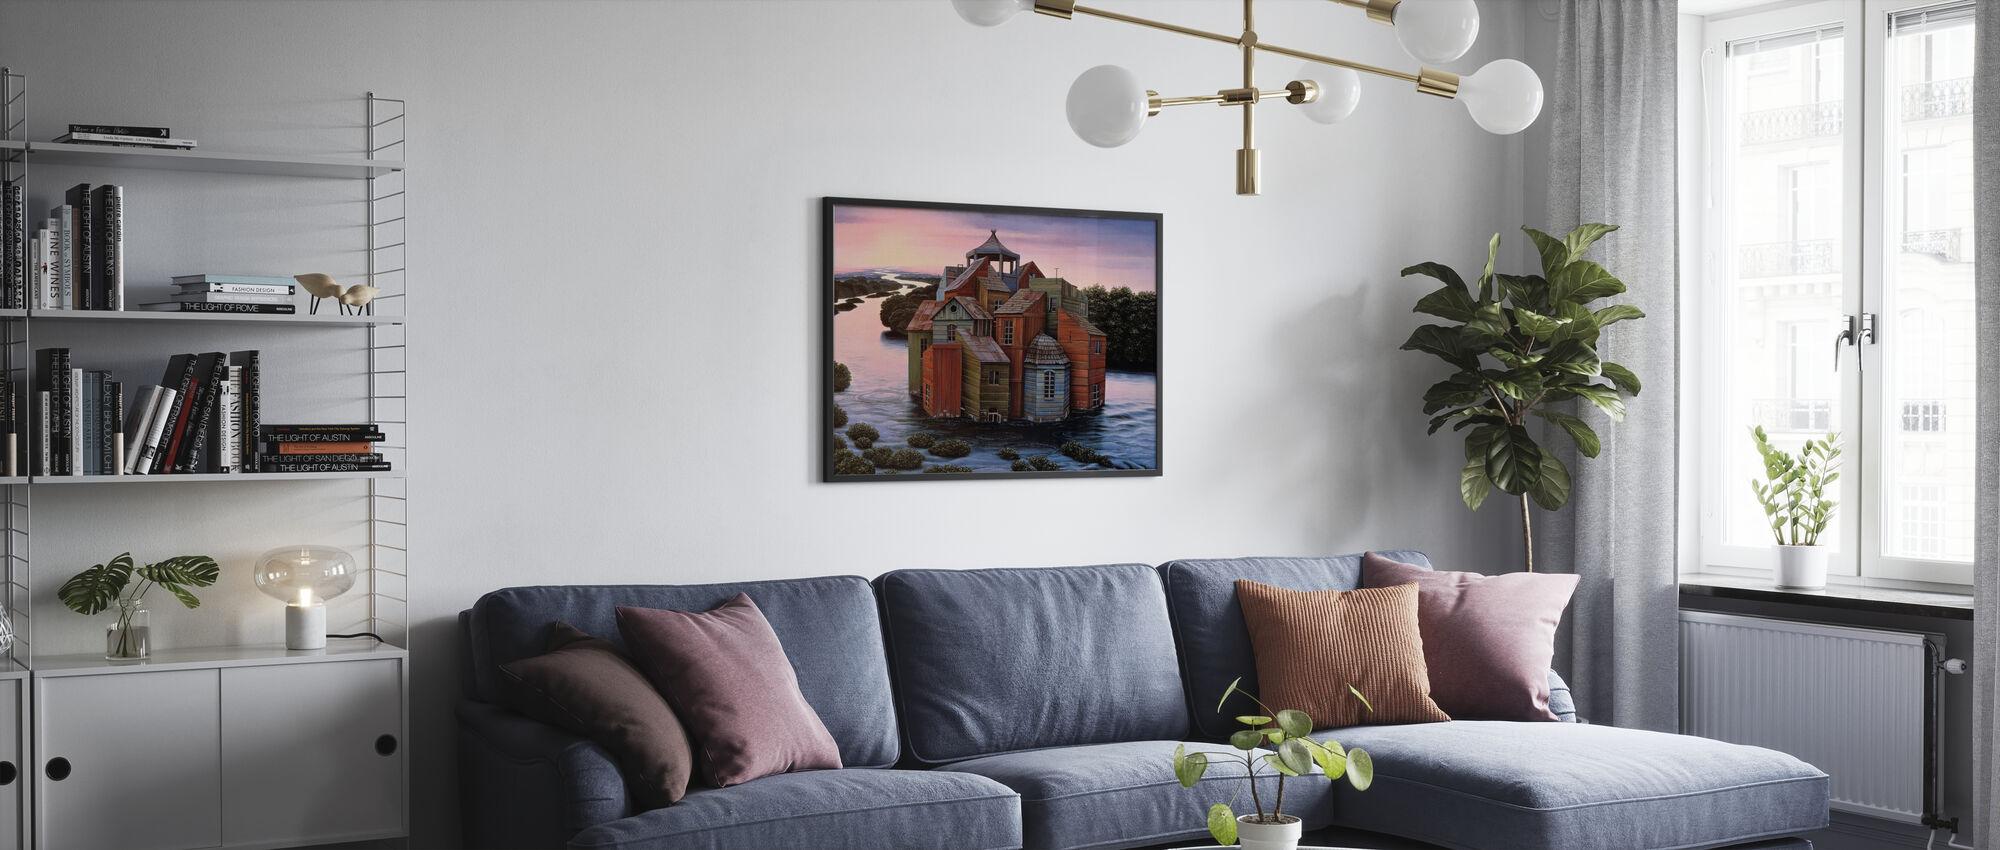 Fallingwater Landgoed - Ingelijste print - Woonkamer